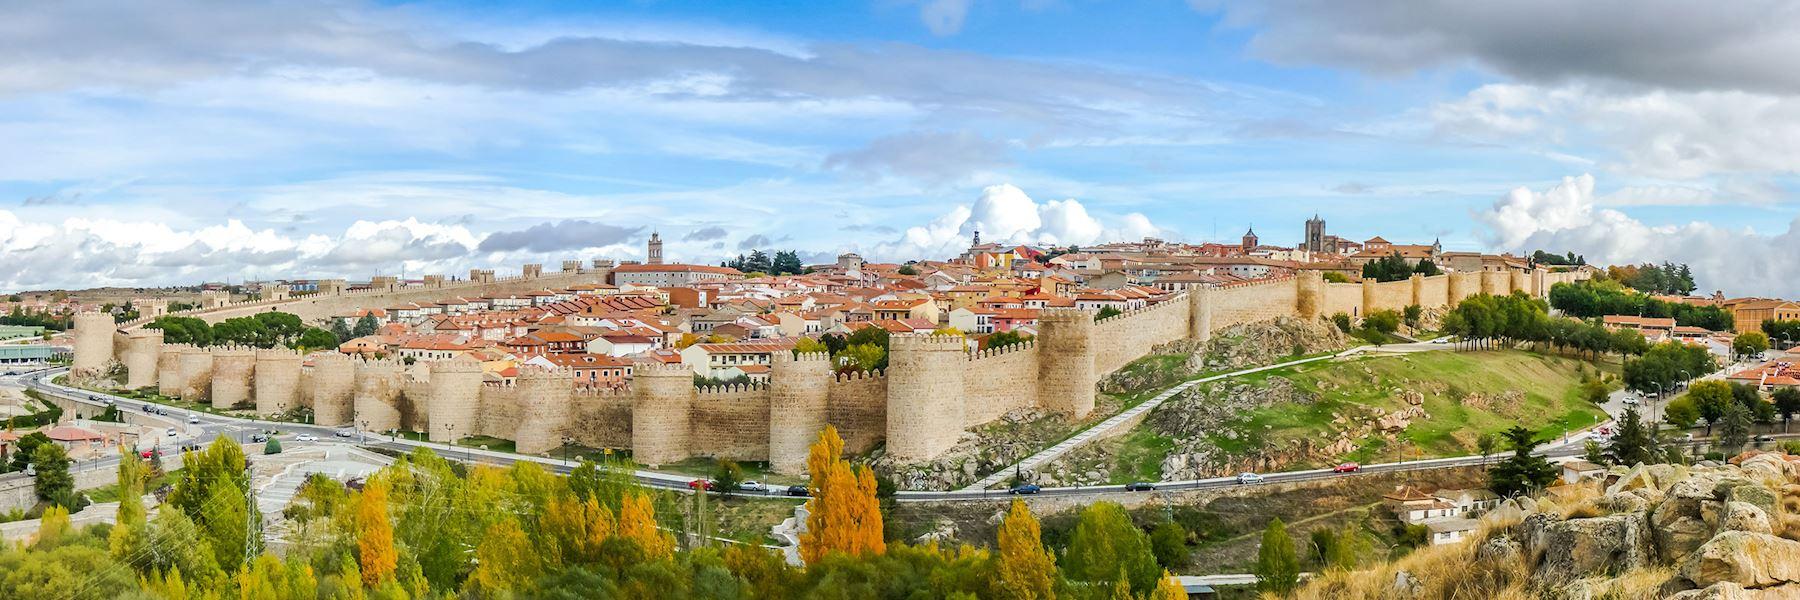 Visit Ávila, Spain